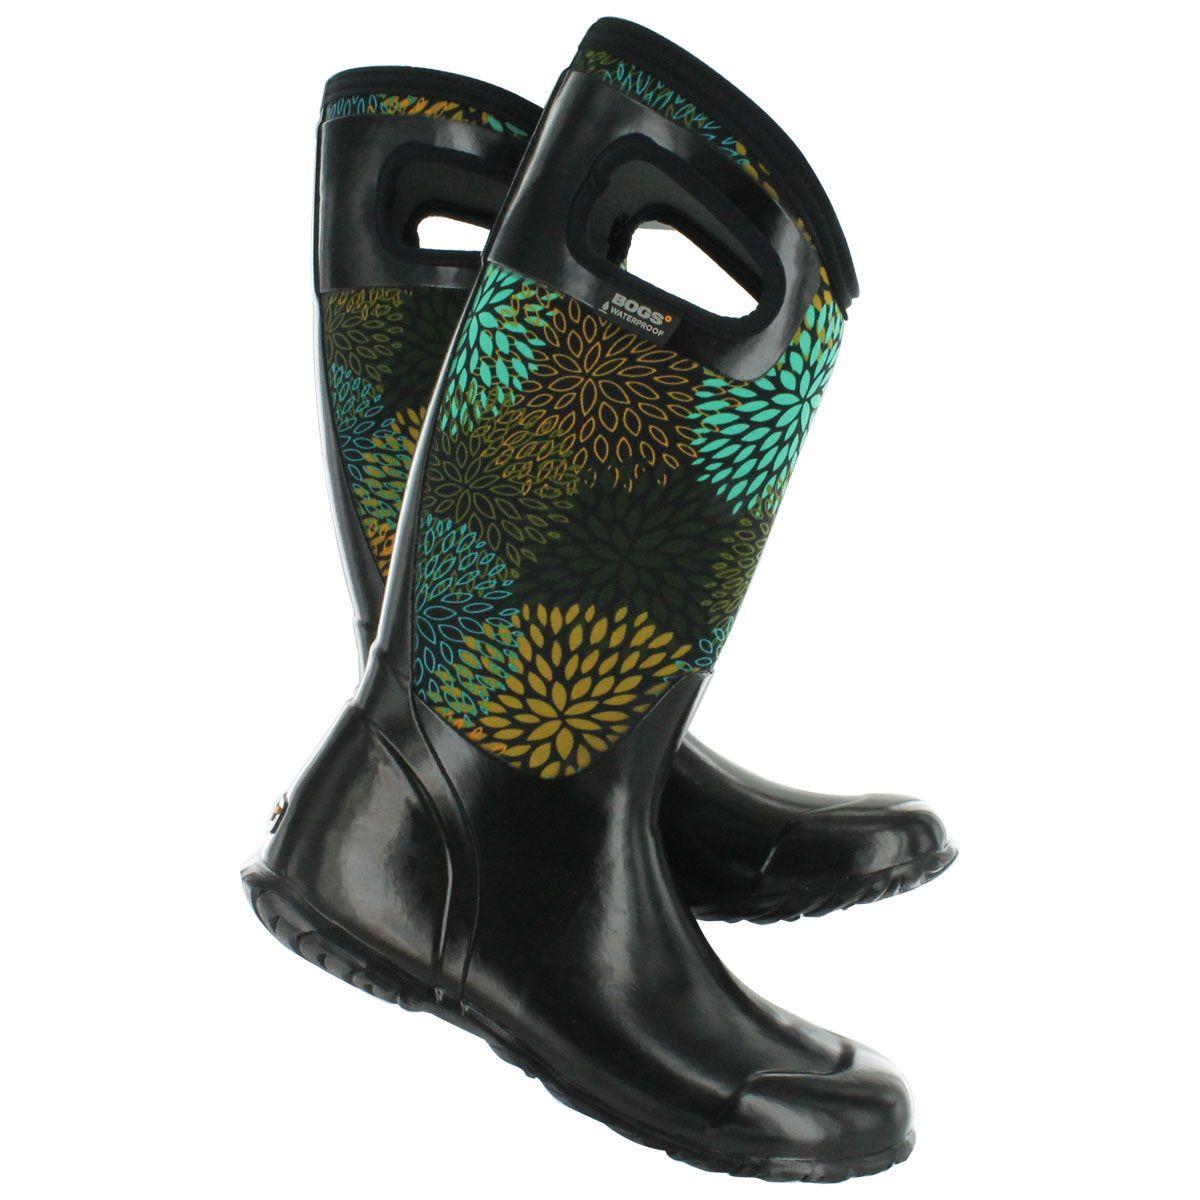 Bogs Women's NORTH HAMPTON FLORAL blk waterproof boots 71551-BLK